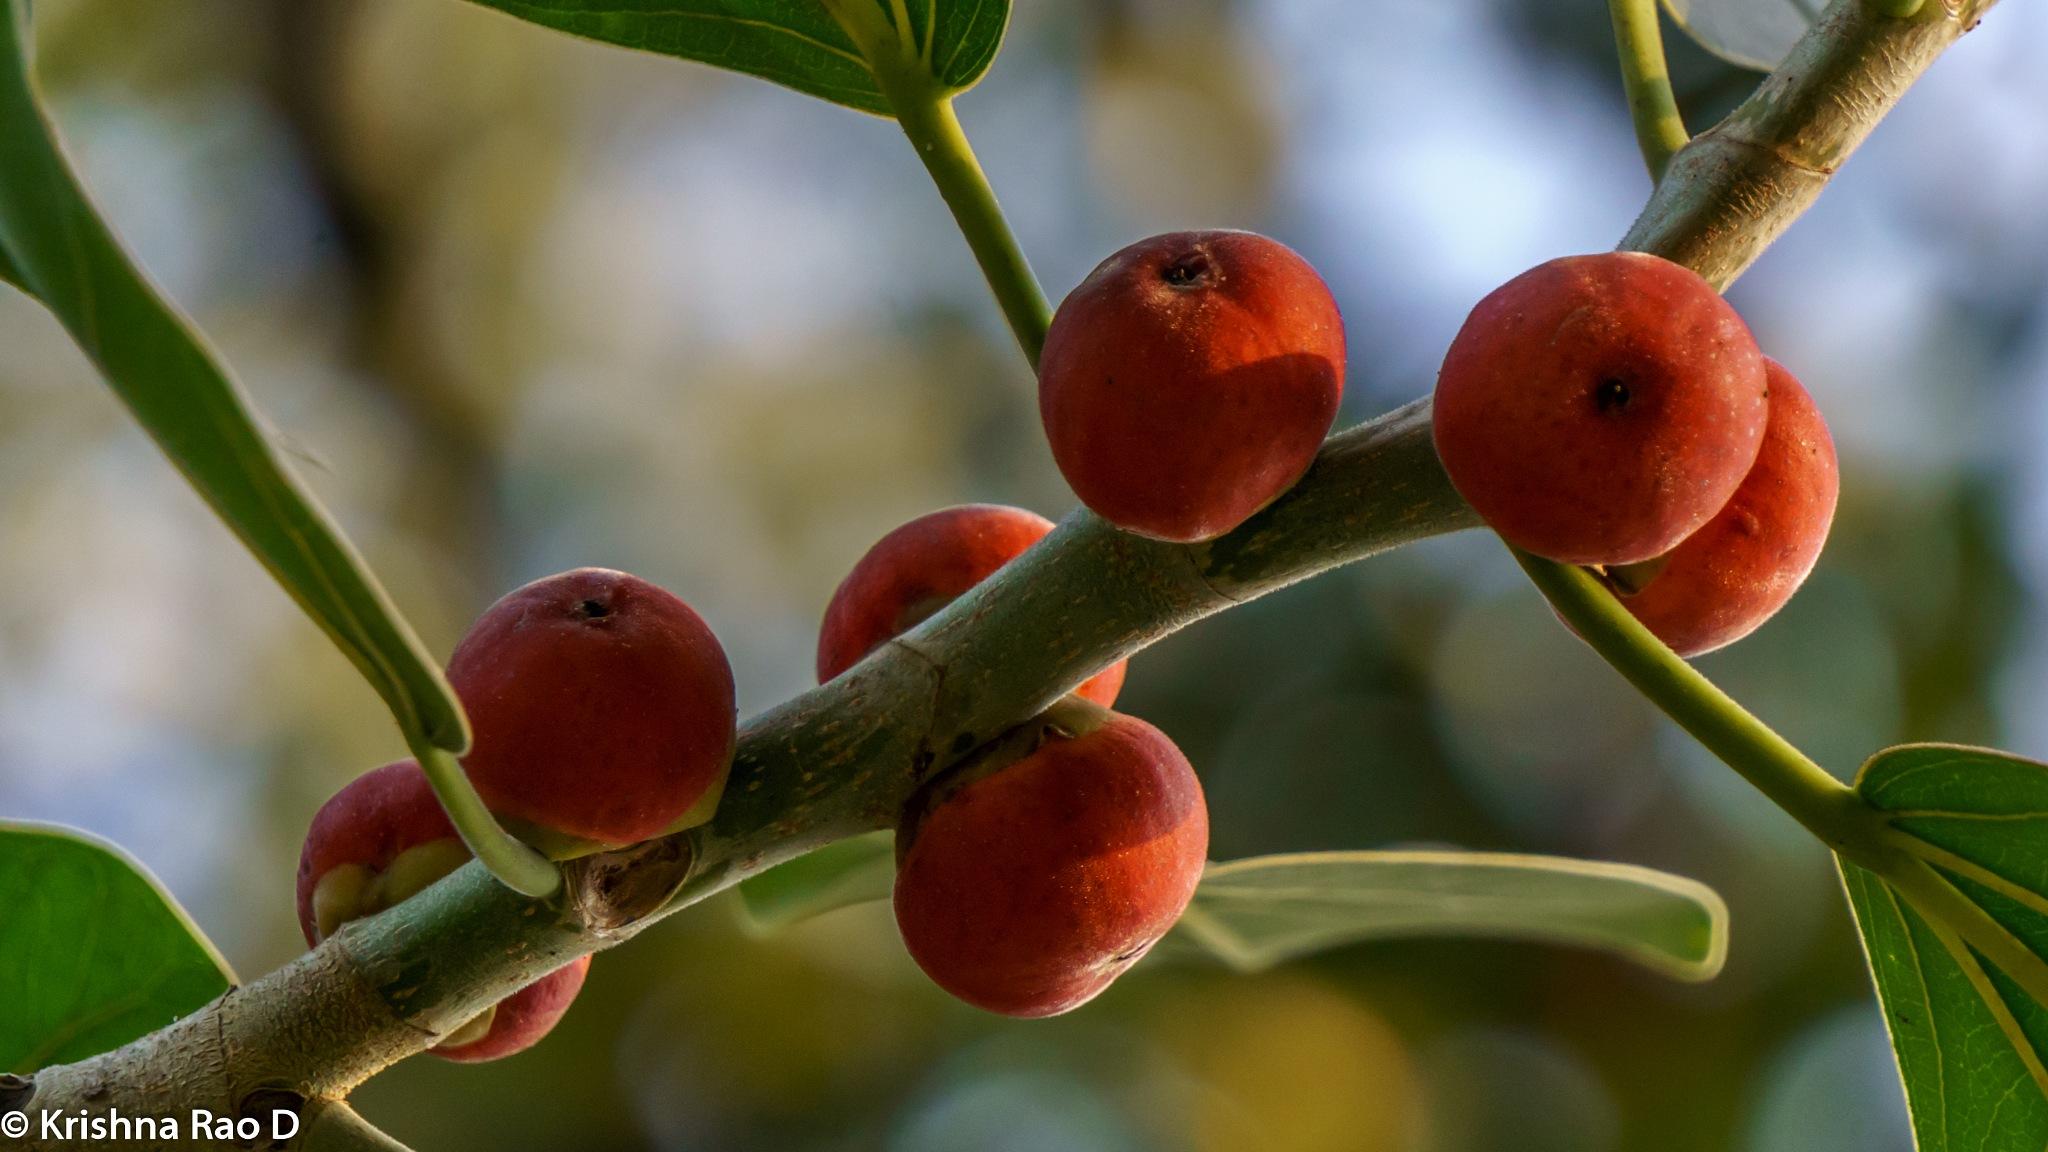 Banyan tree fruits by Krishna Rao D